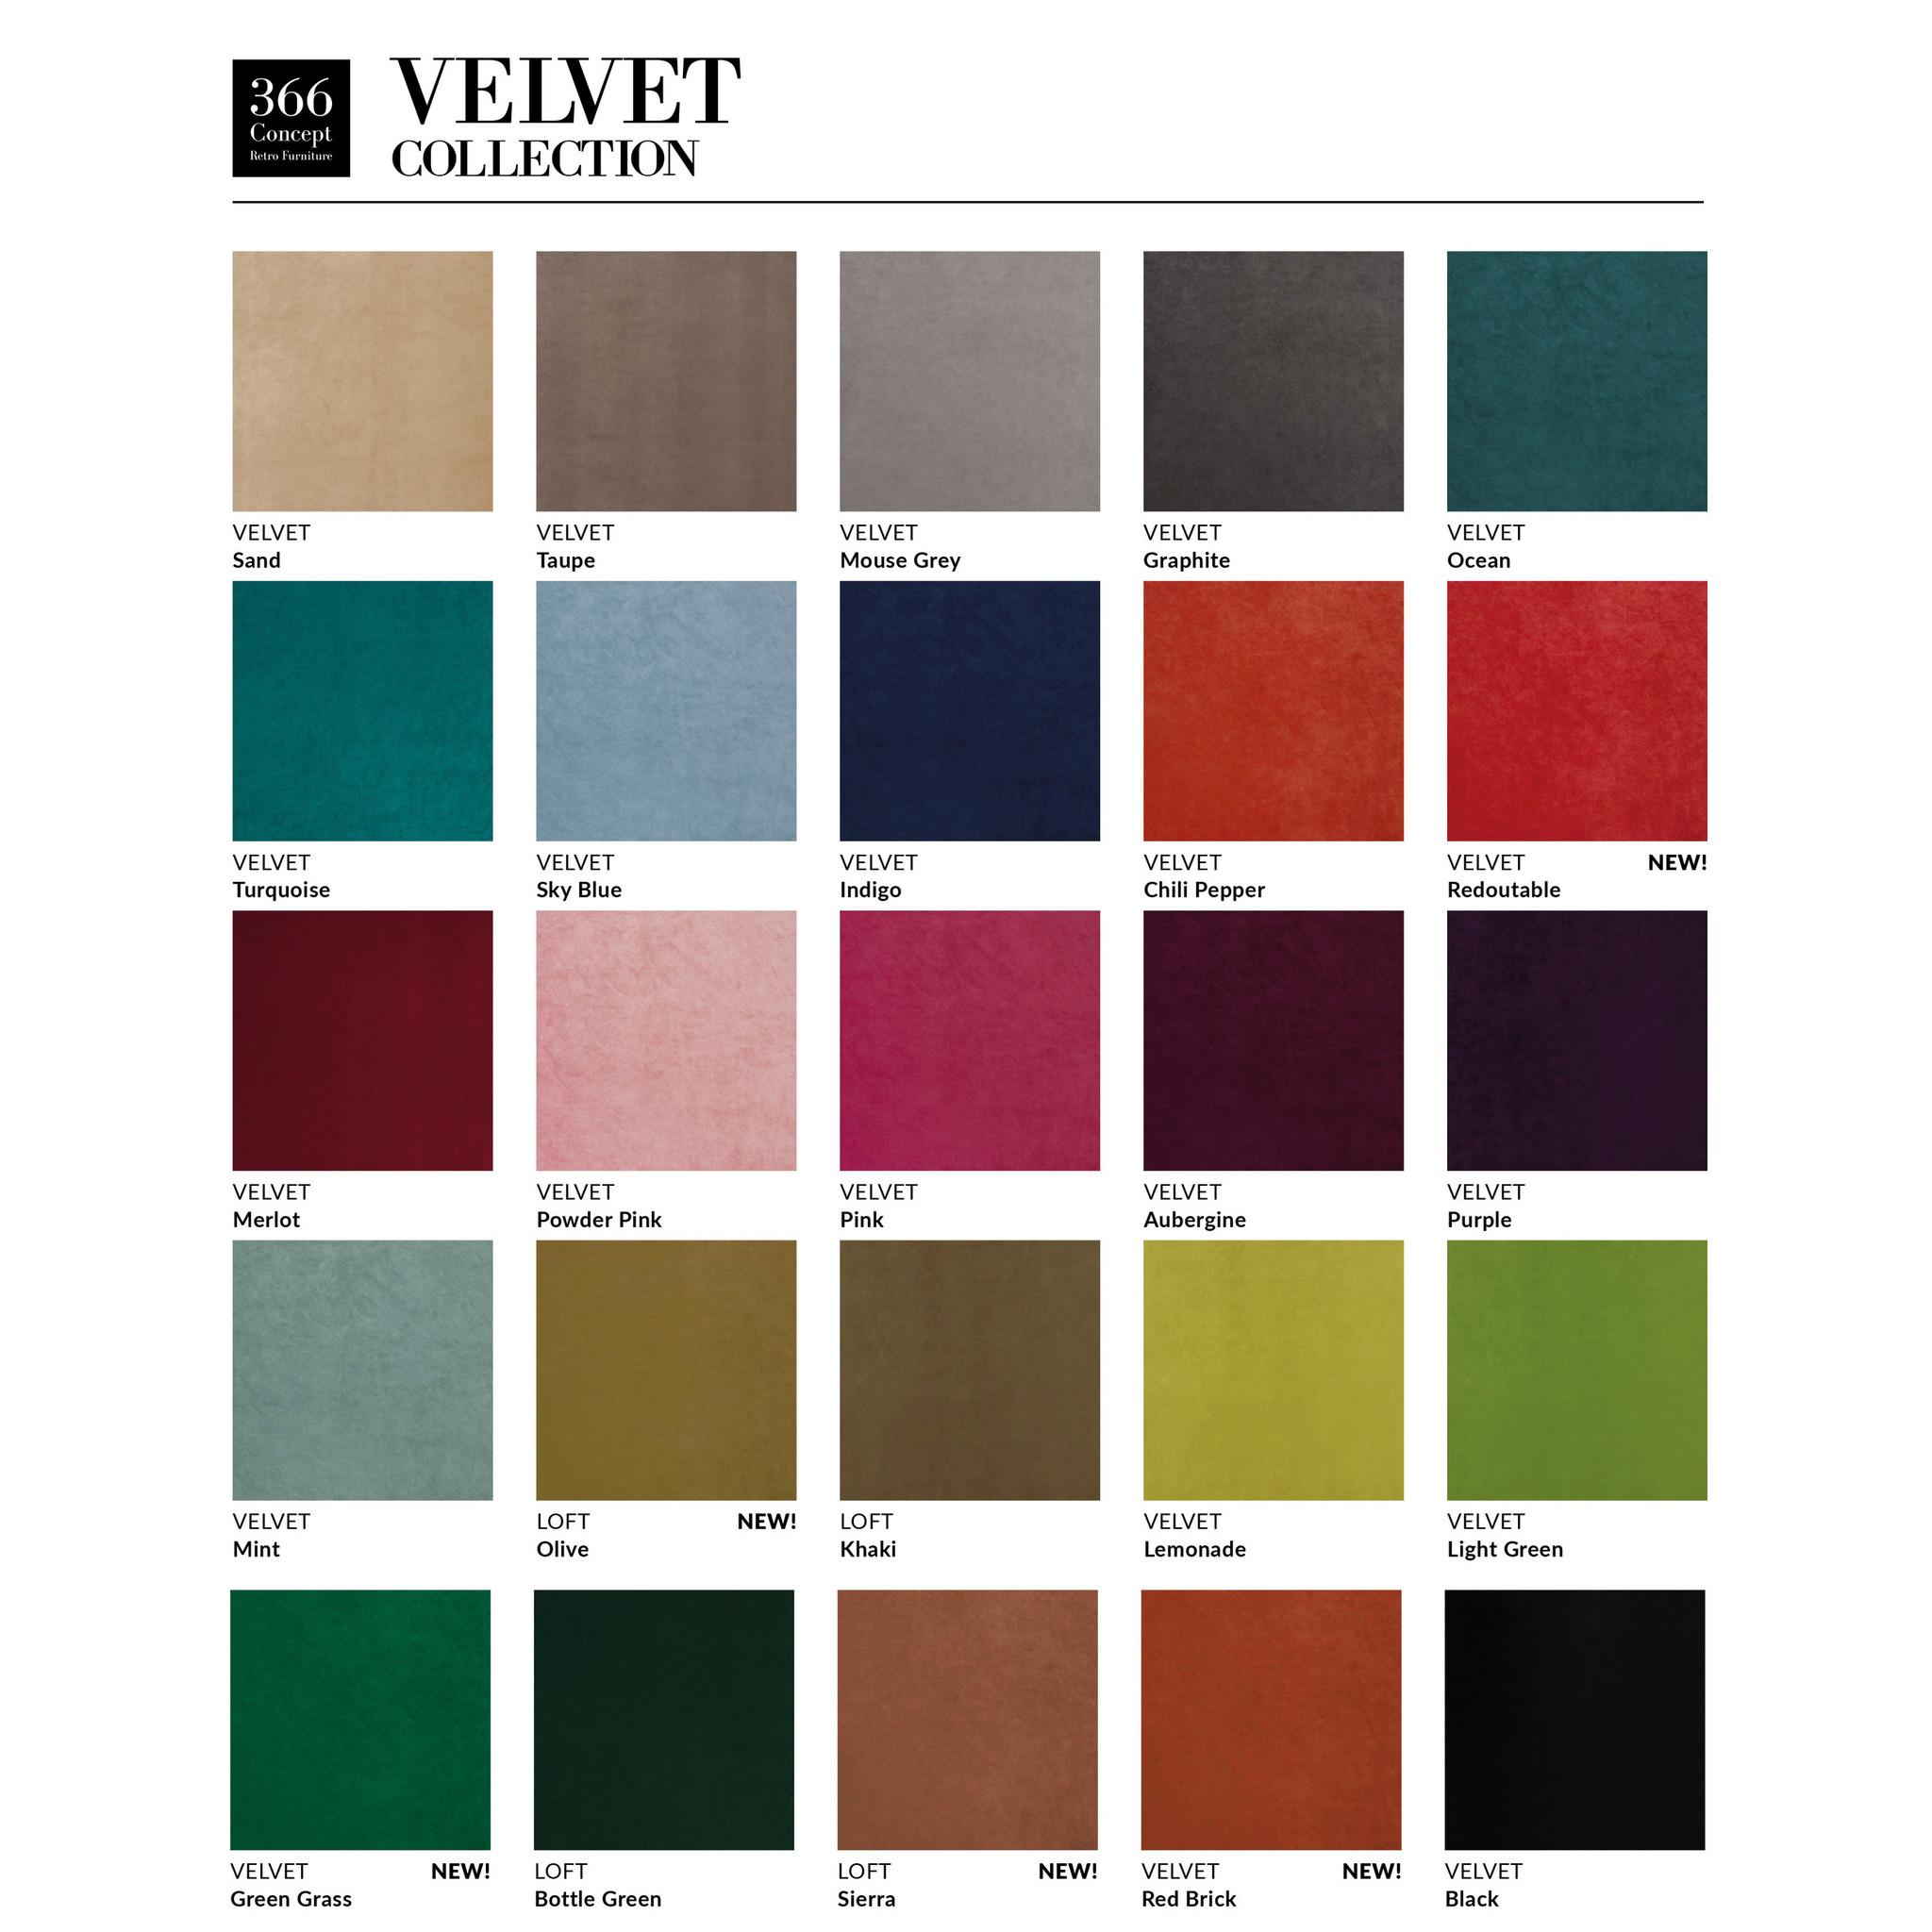 366 Concept Fox Armchair Velvet - Hout in foto's is donkere es!